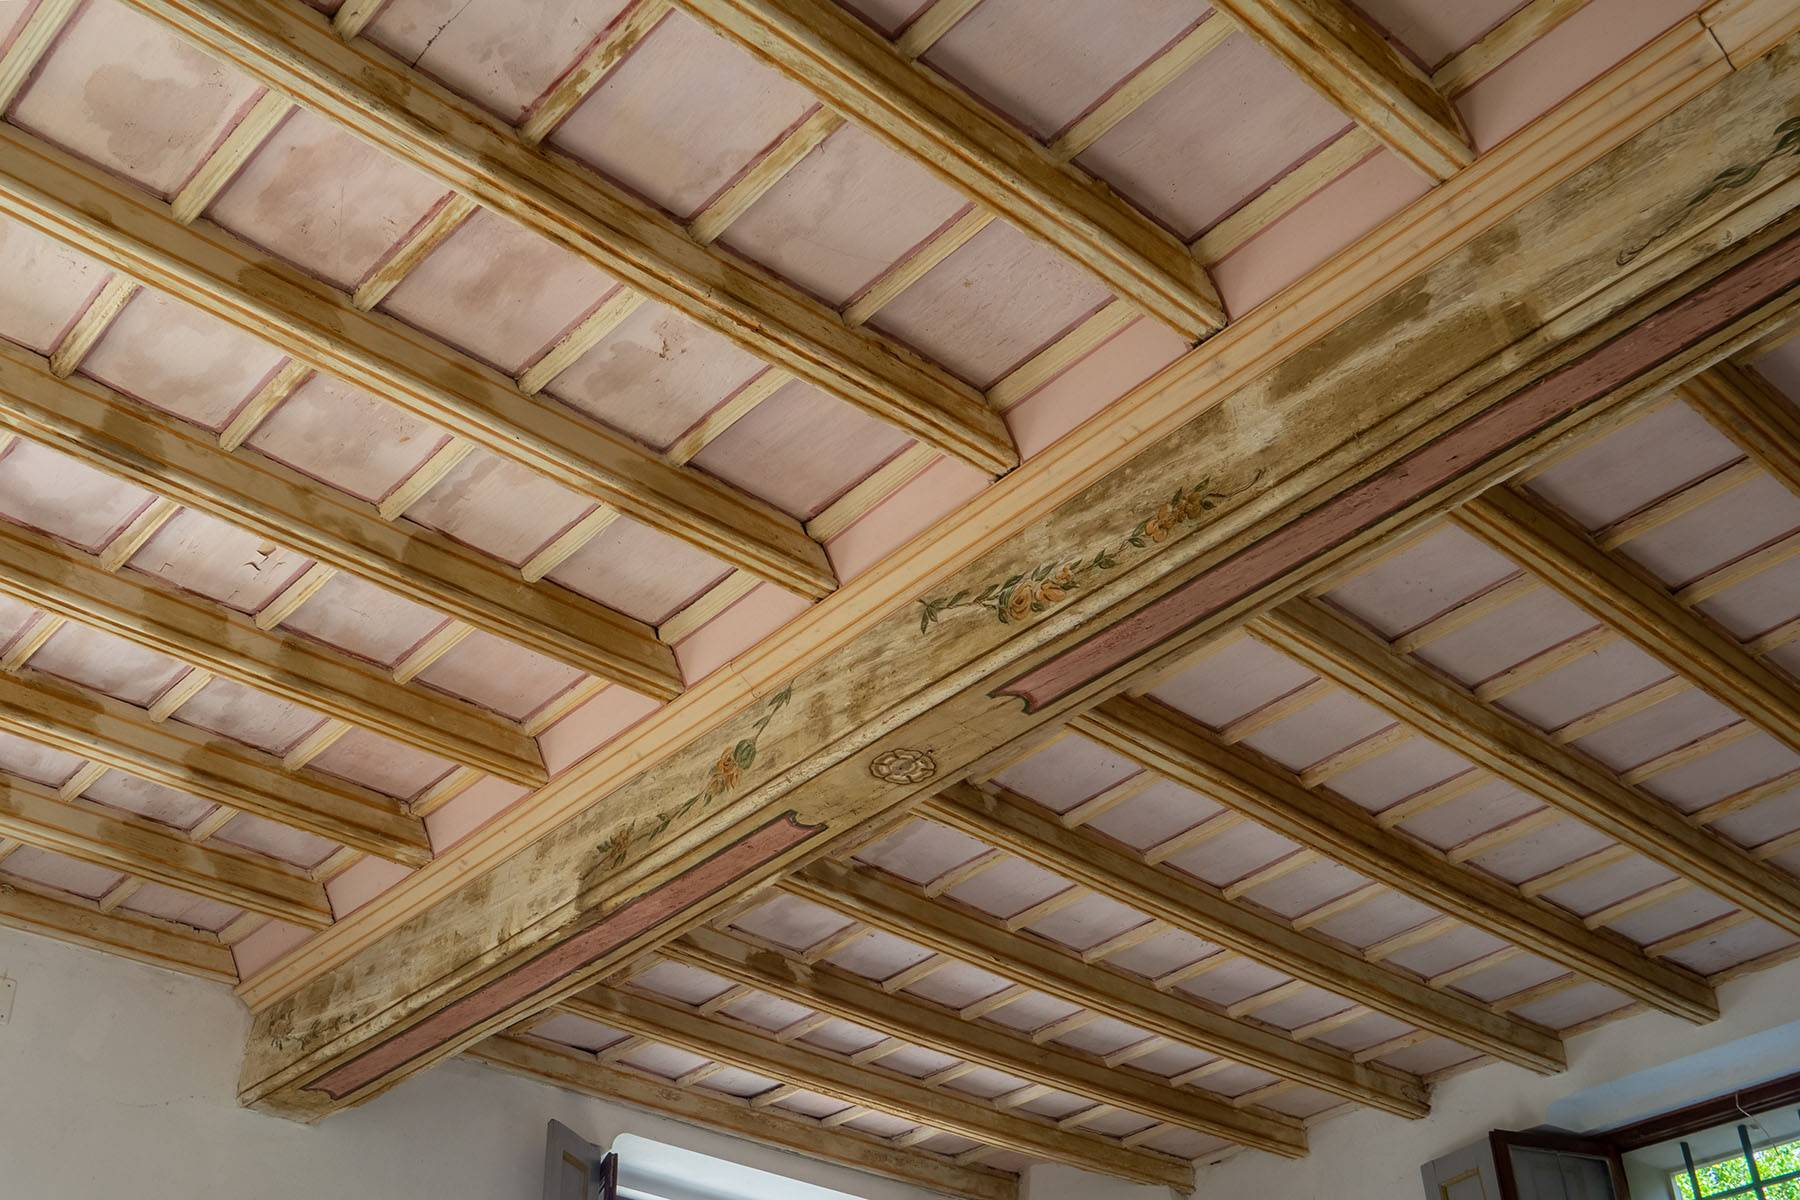 Casa indipendente in Vendita a Torino: 5 locali, 400 mq - Foto 15